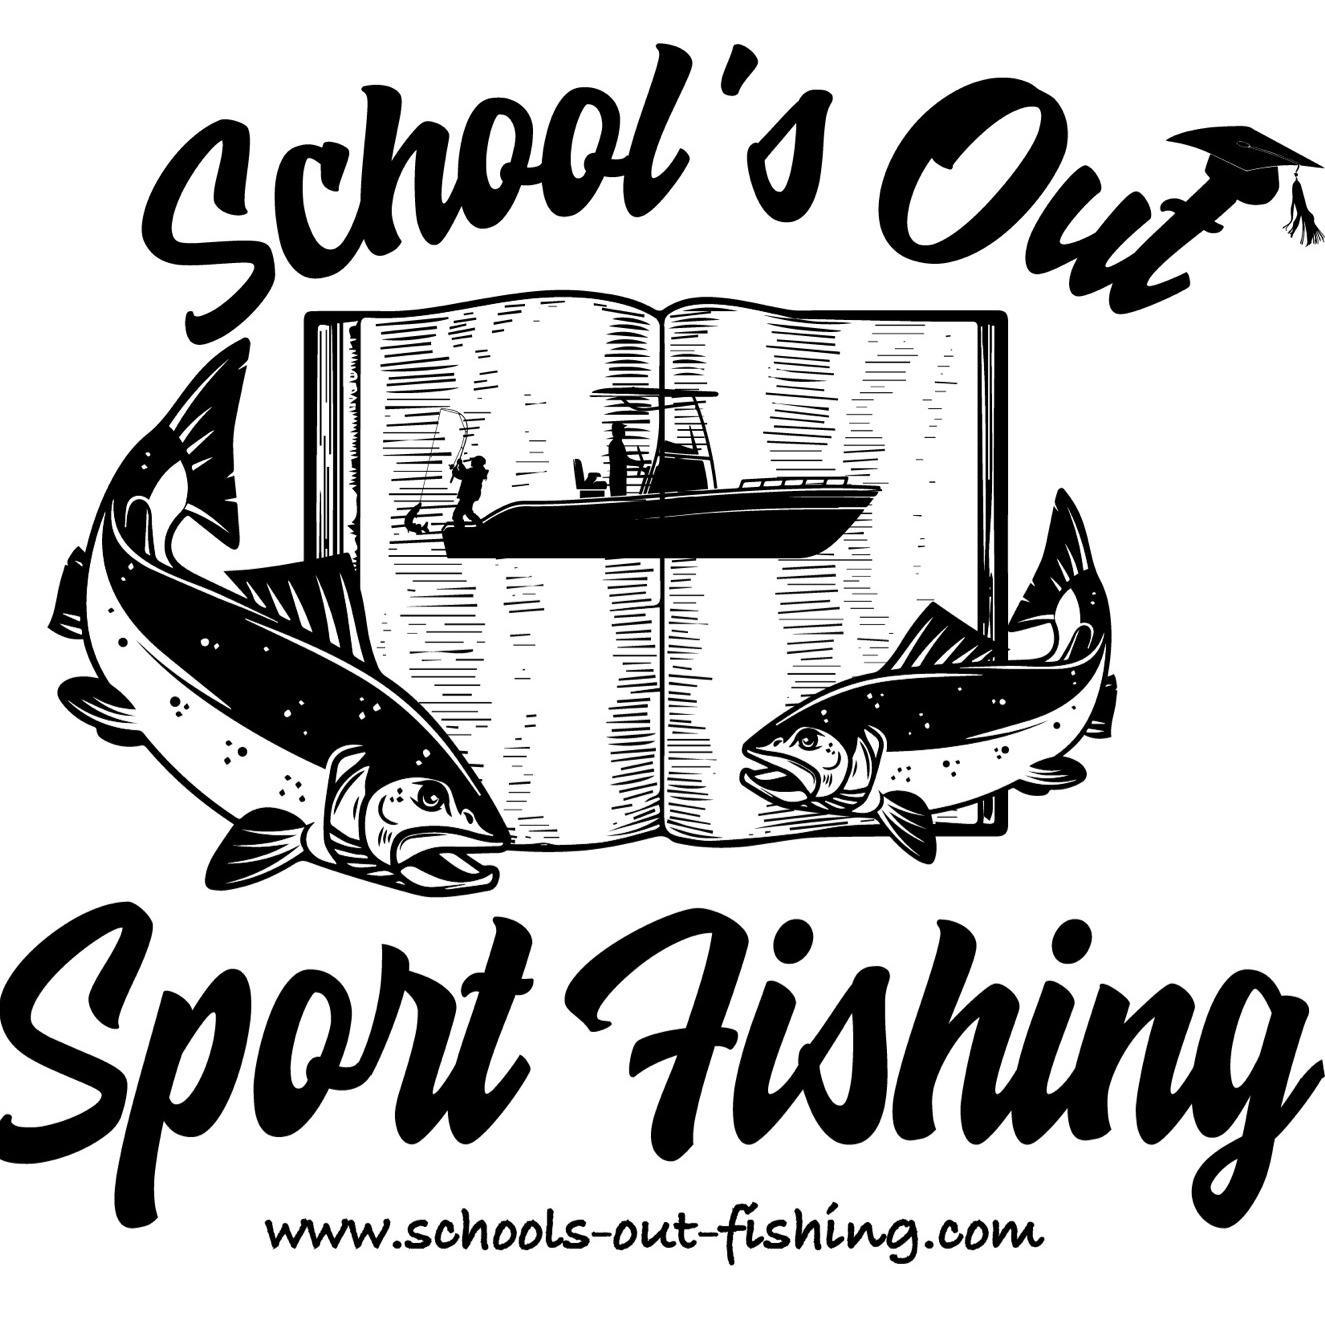 School's Out Sport Fishing LLC - Kenosha, WI 53140 - (262)689-5633 | ShowMeLocal.com